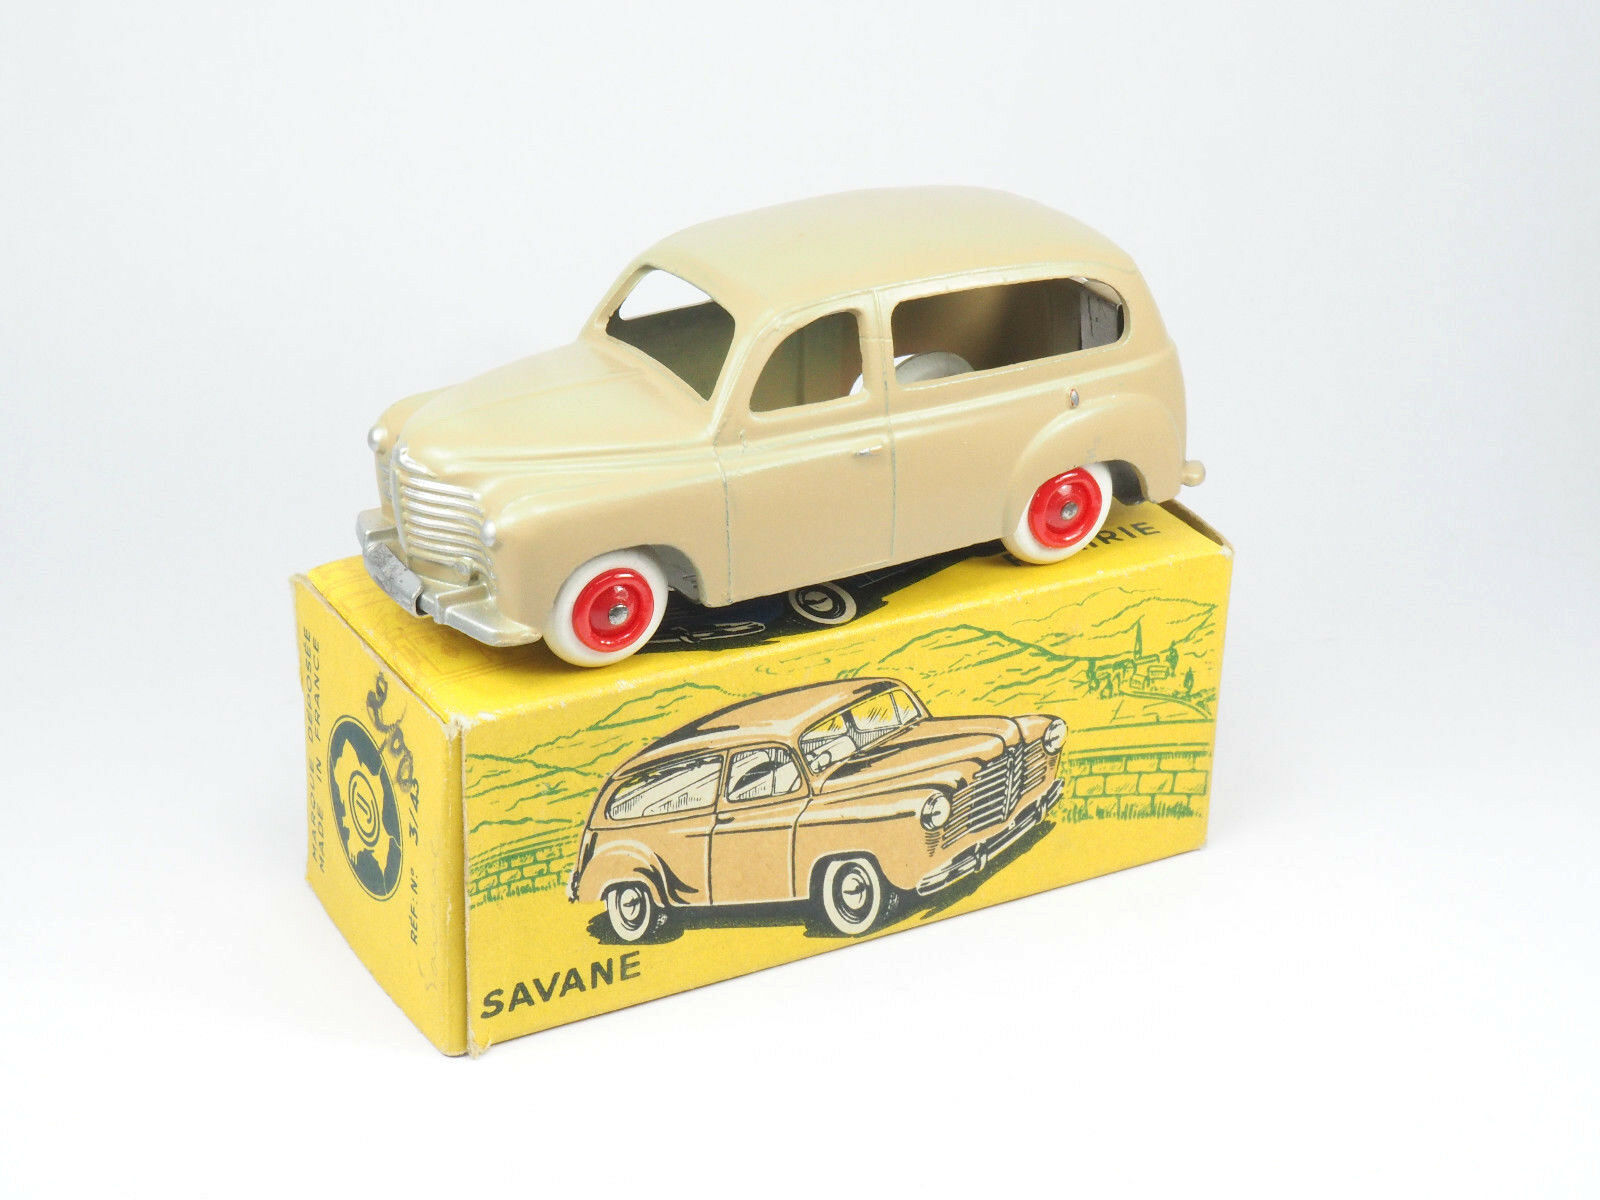 CIJ - Ref 3 43 - Renault Coloreeale Savane - 1 43e - France